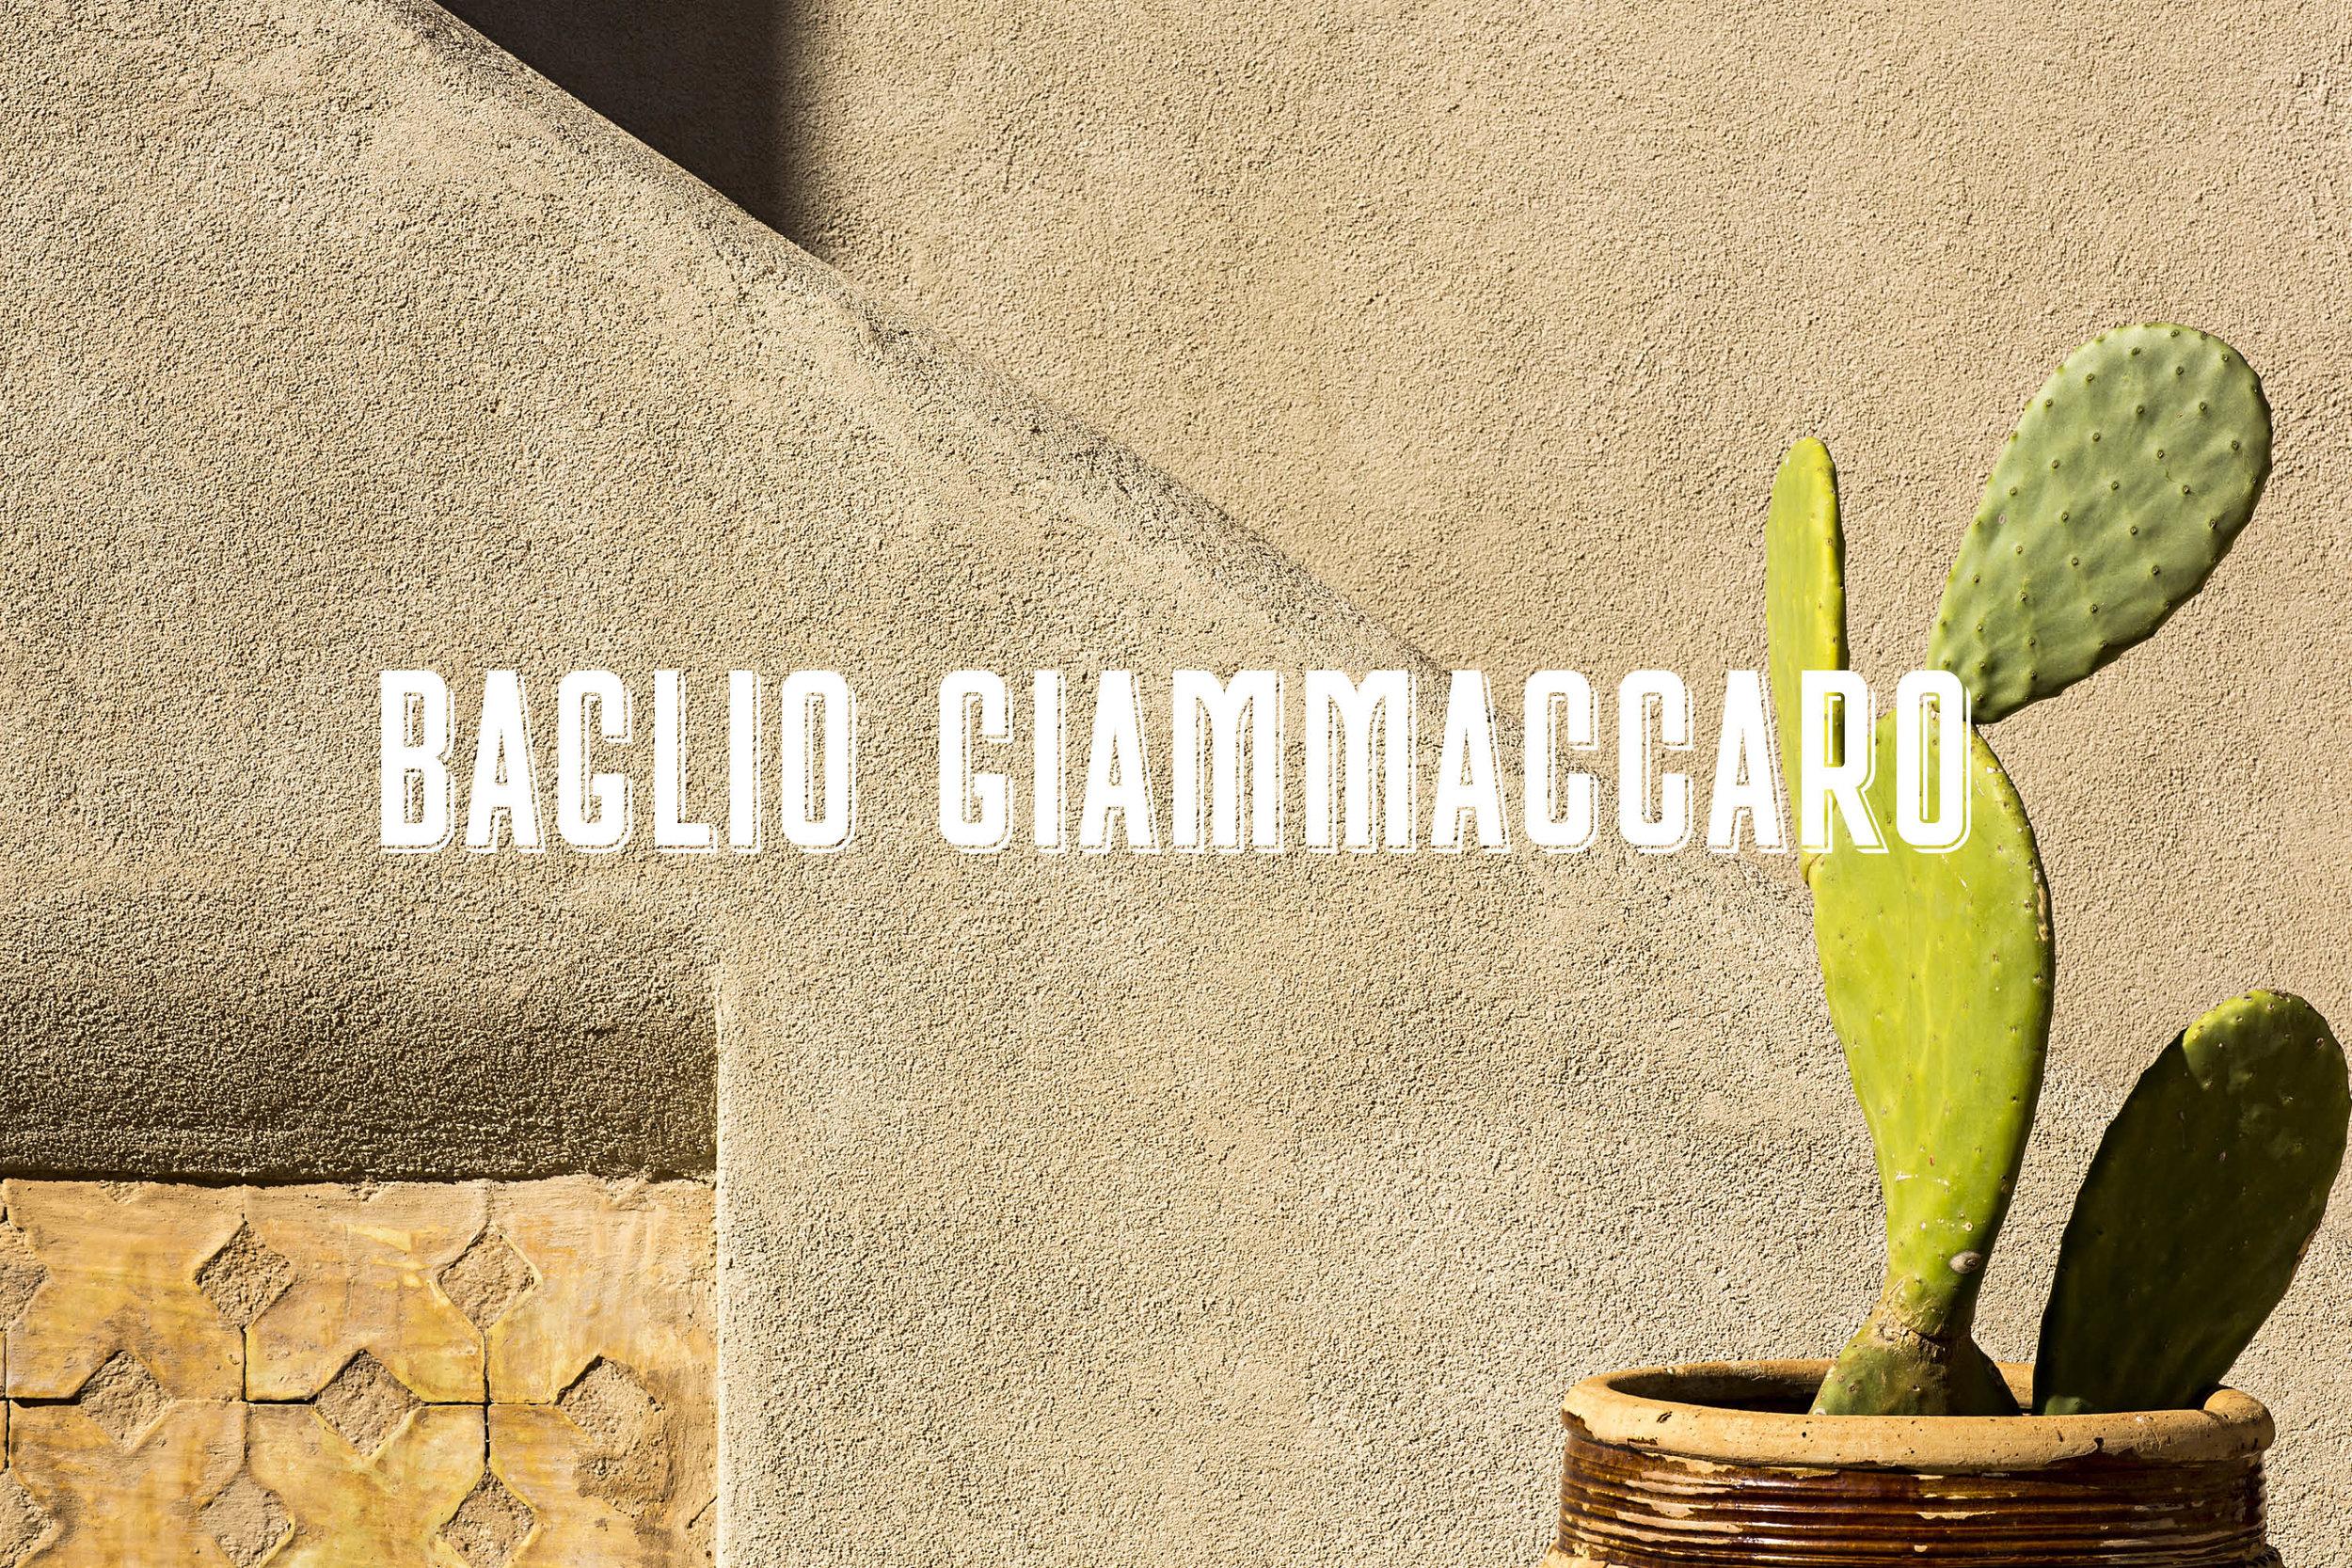 CounterStudio_BaglioGiammaccaro_Hero.jpg